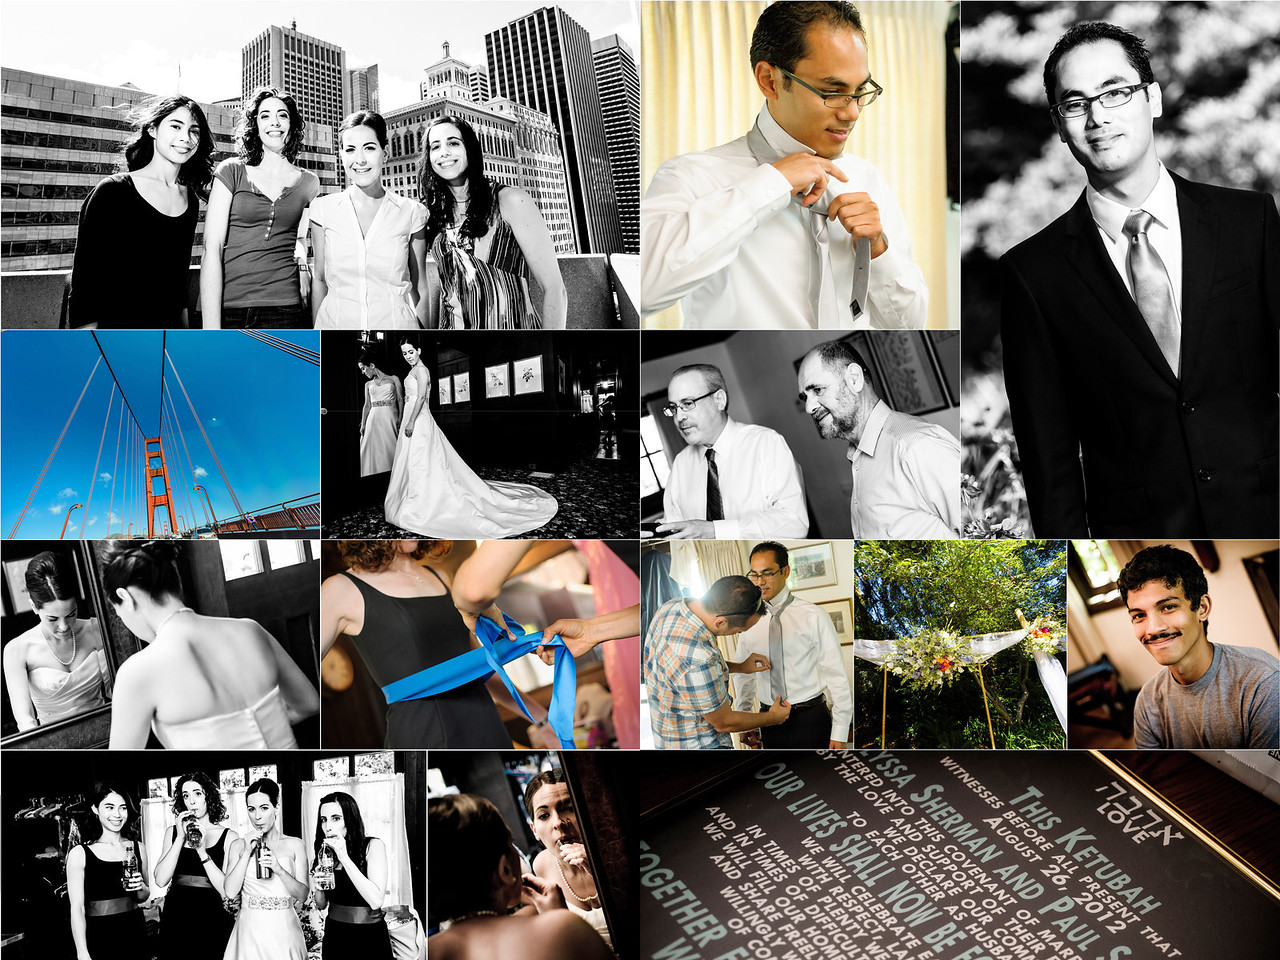 Alyssa_and_Paul_Wedding_Photography_4x6_Photo_Board_02